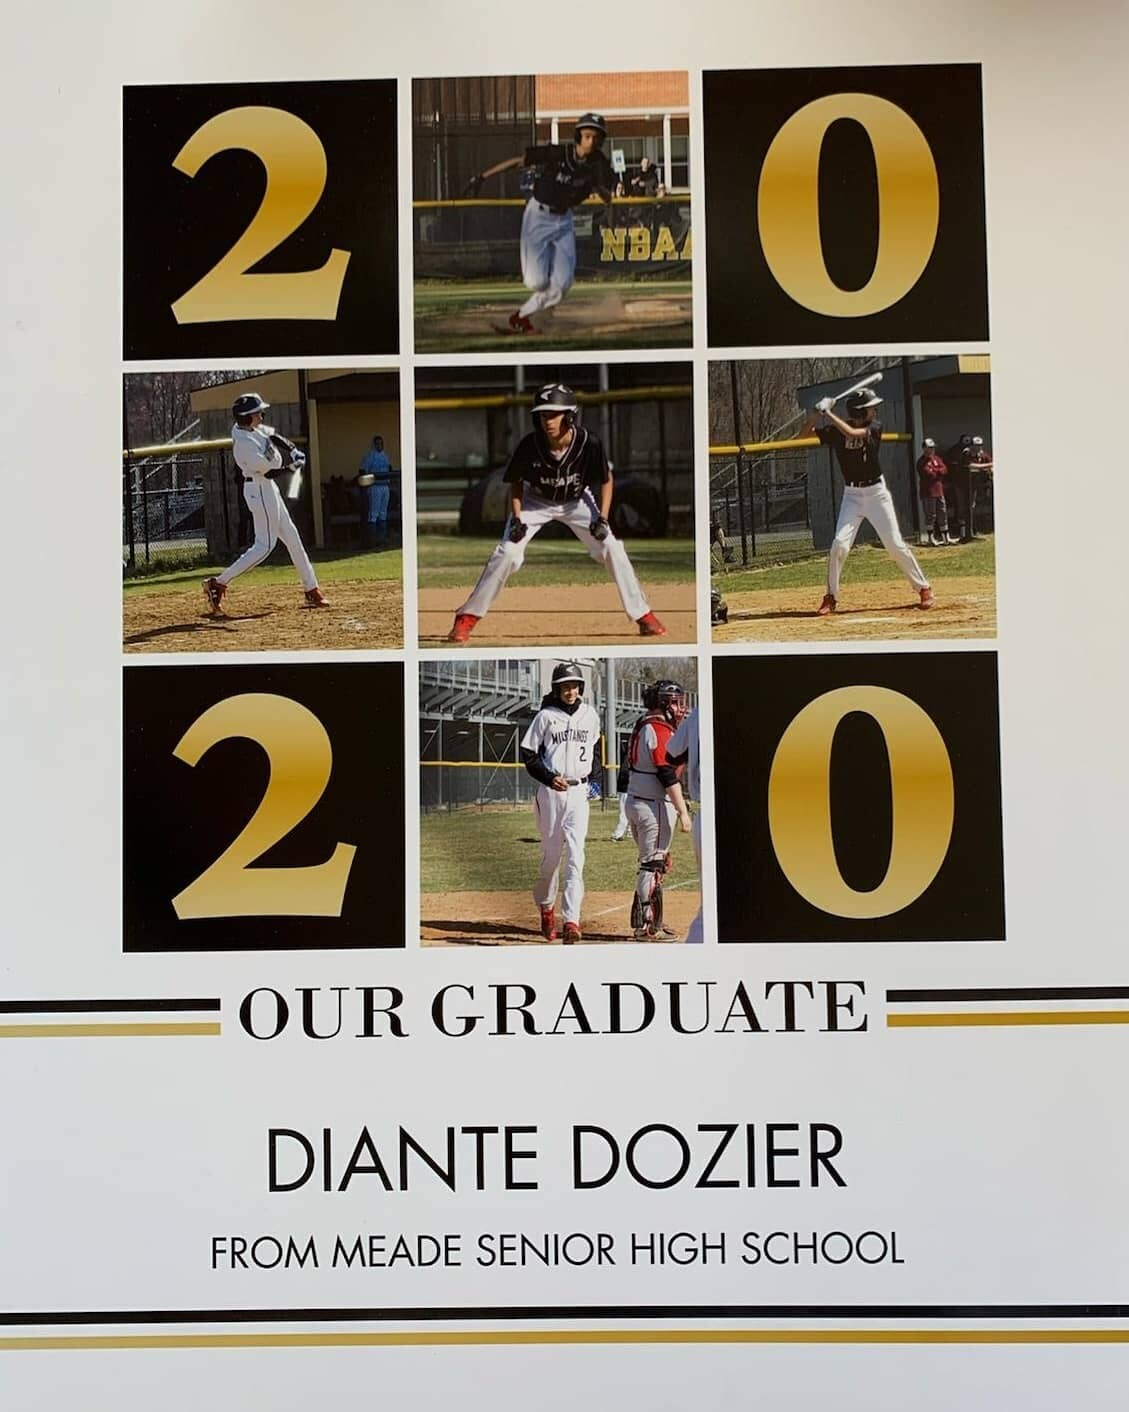 Diante Dozier & Eli Balbosa (3 of 4)